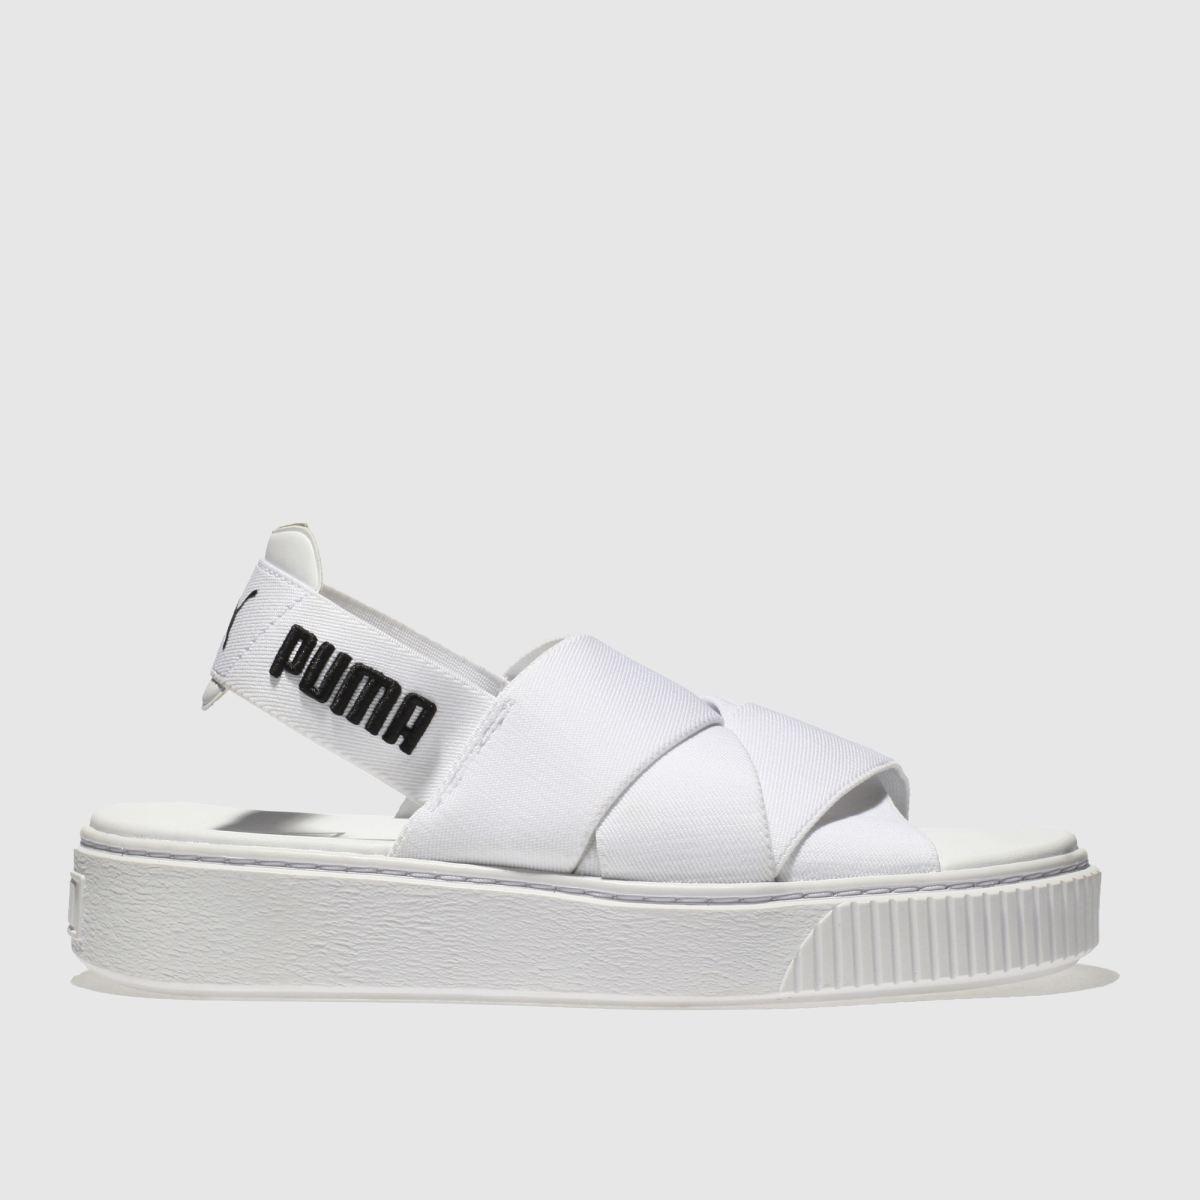 Puma White Platform Sandal Sandals